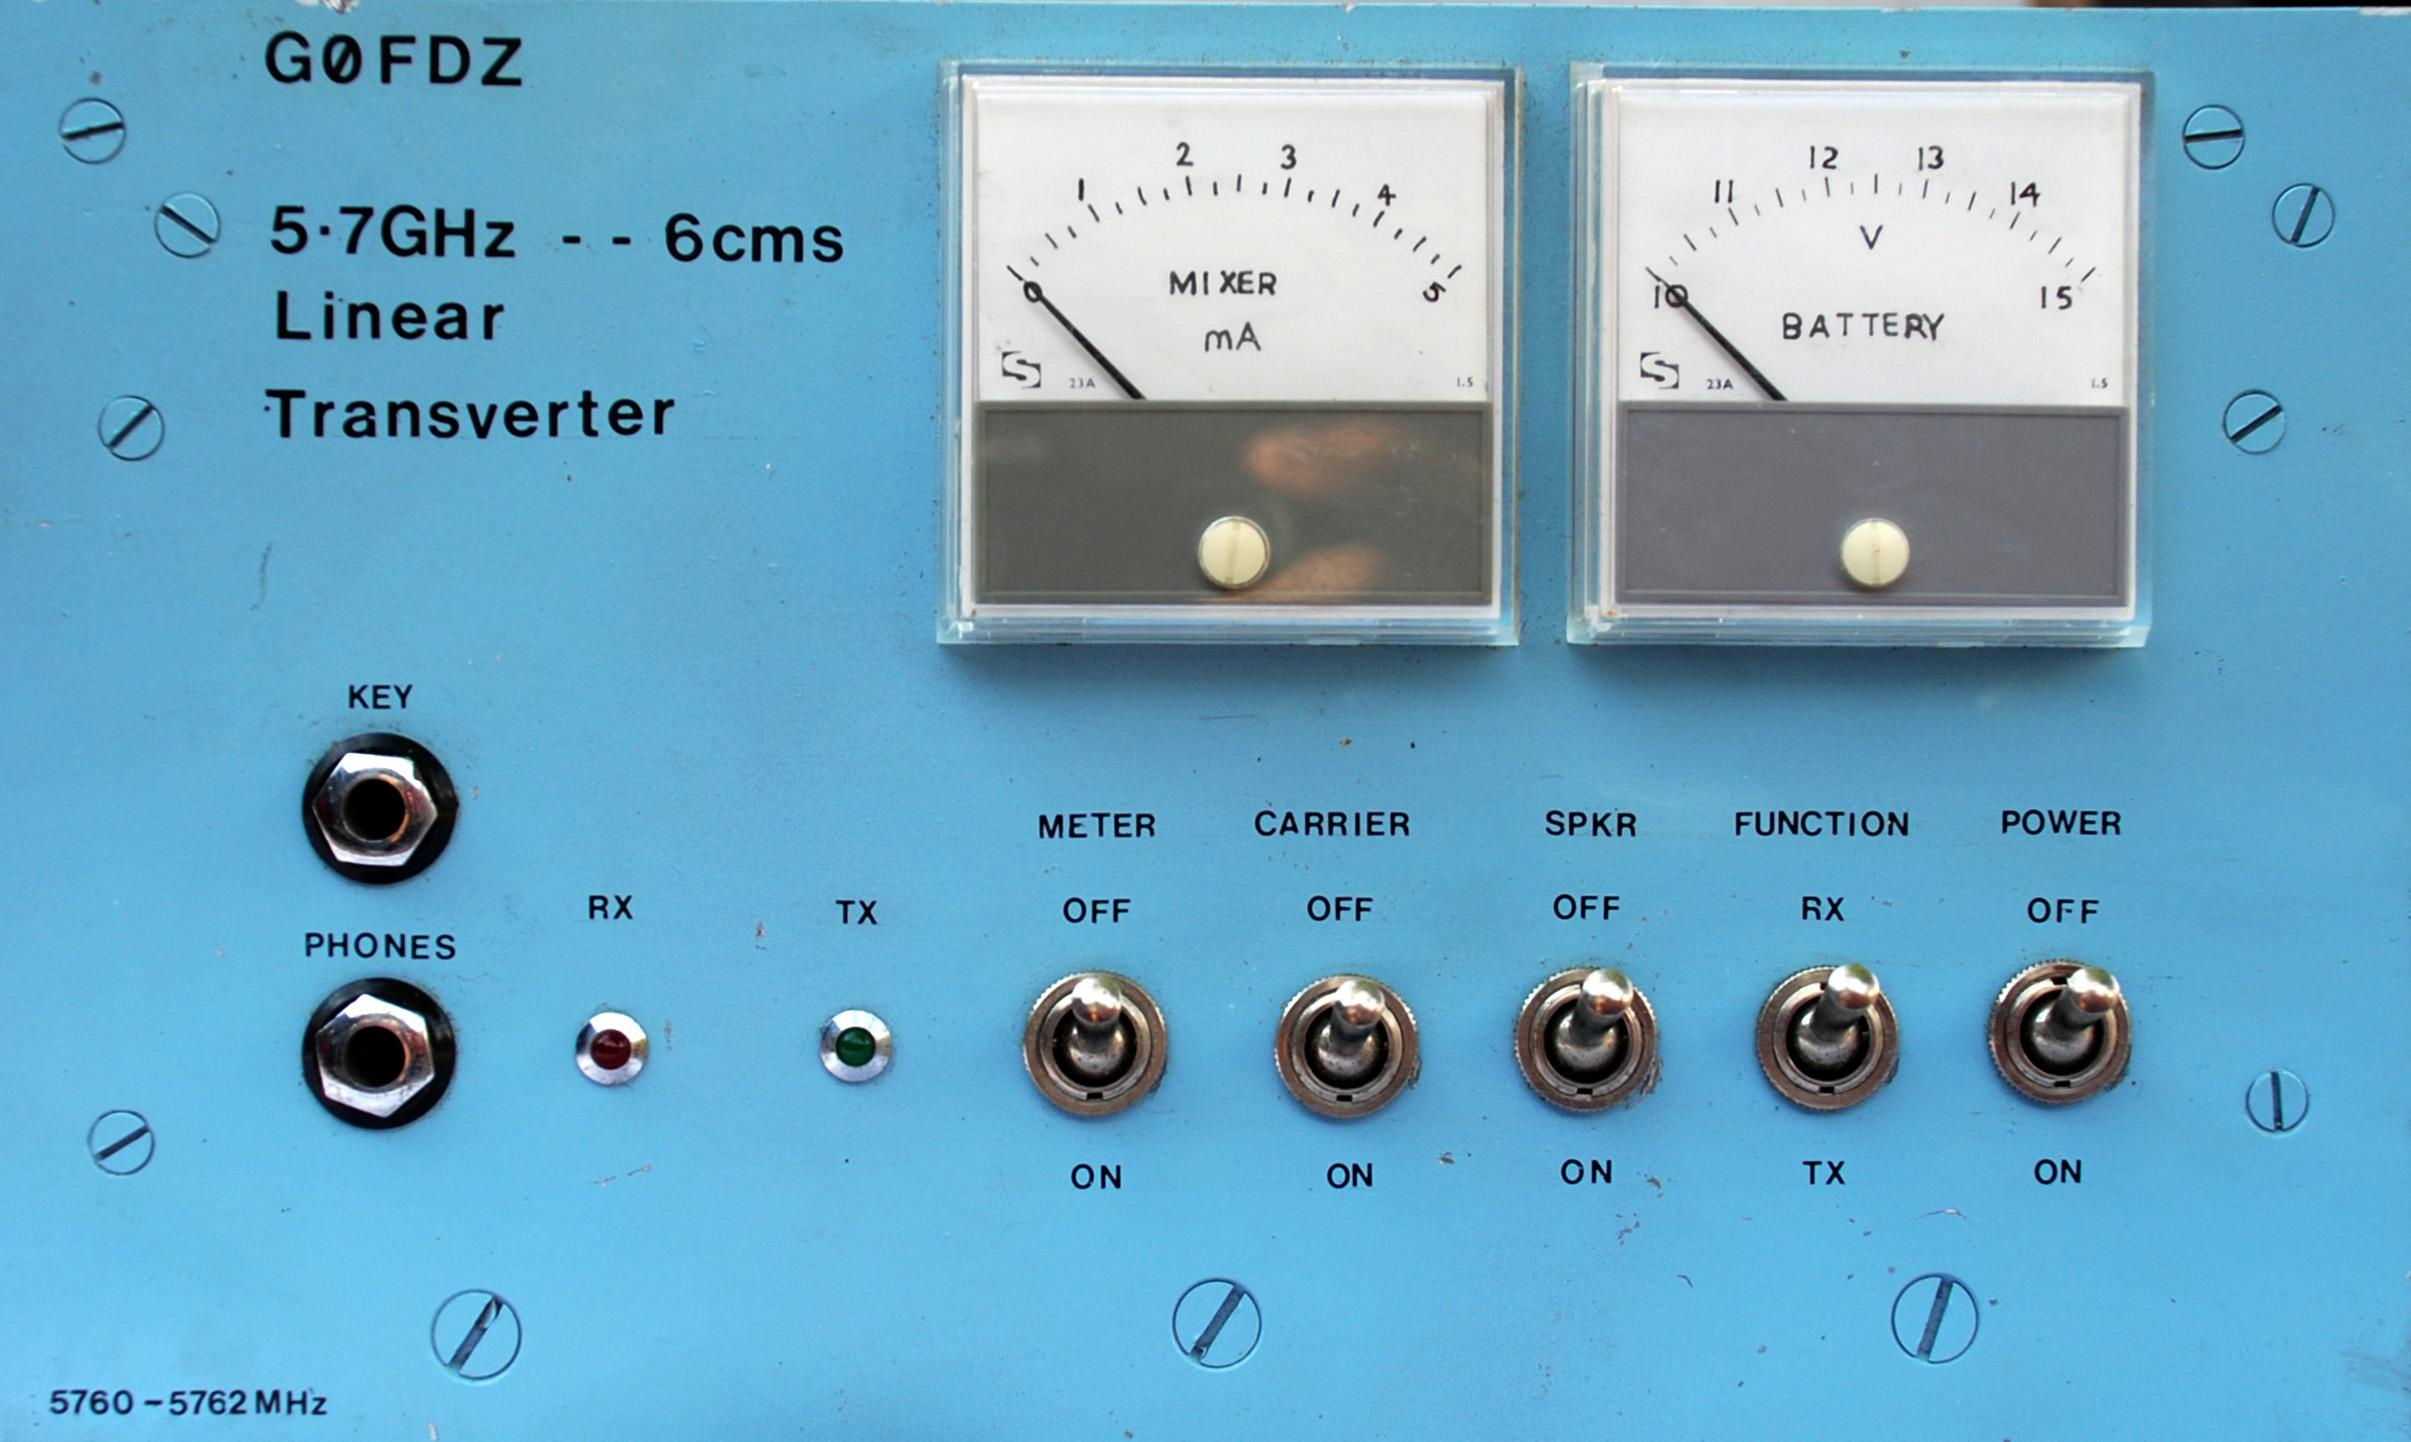 5 7 GHz JVL Transverter @ The Microwave Museum